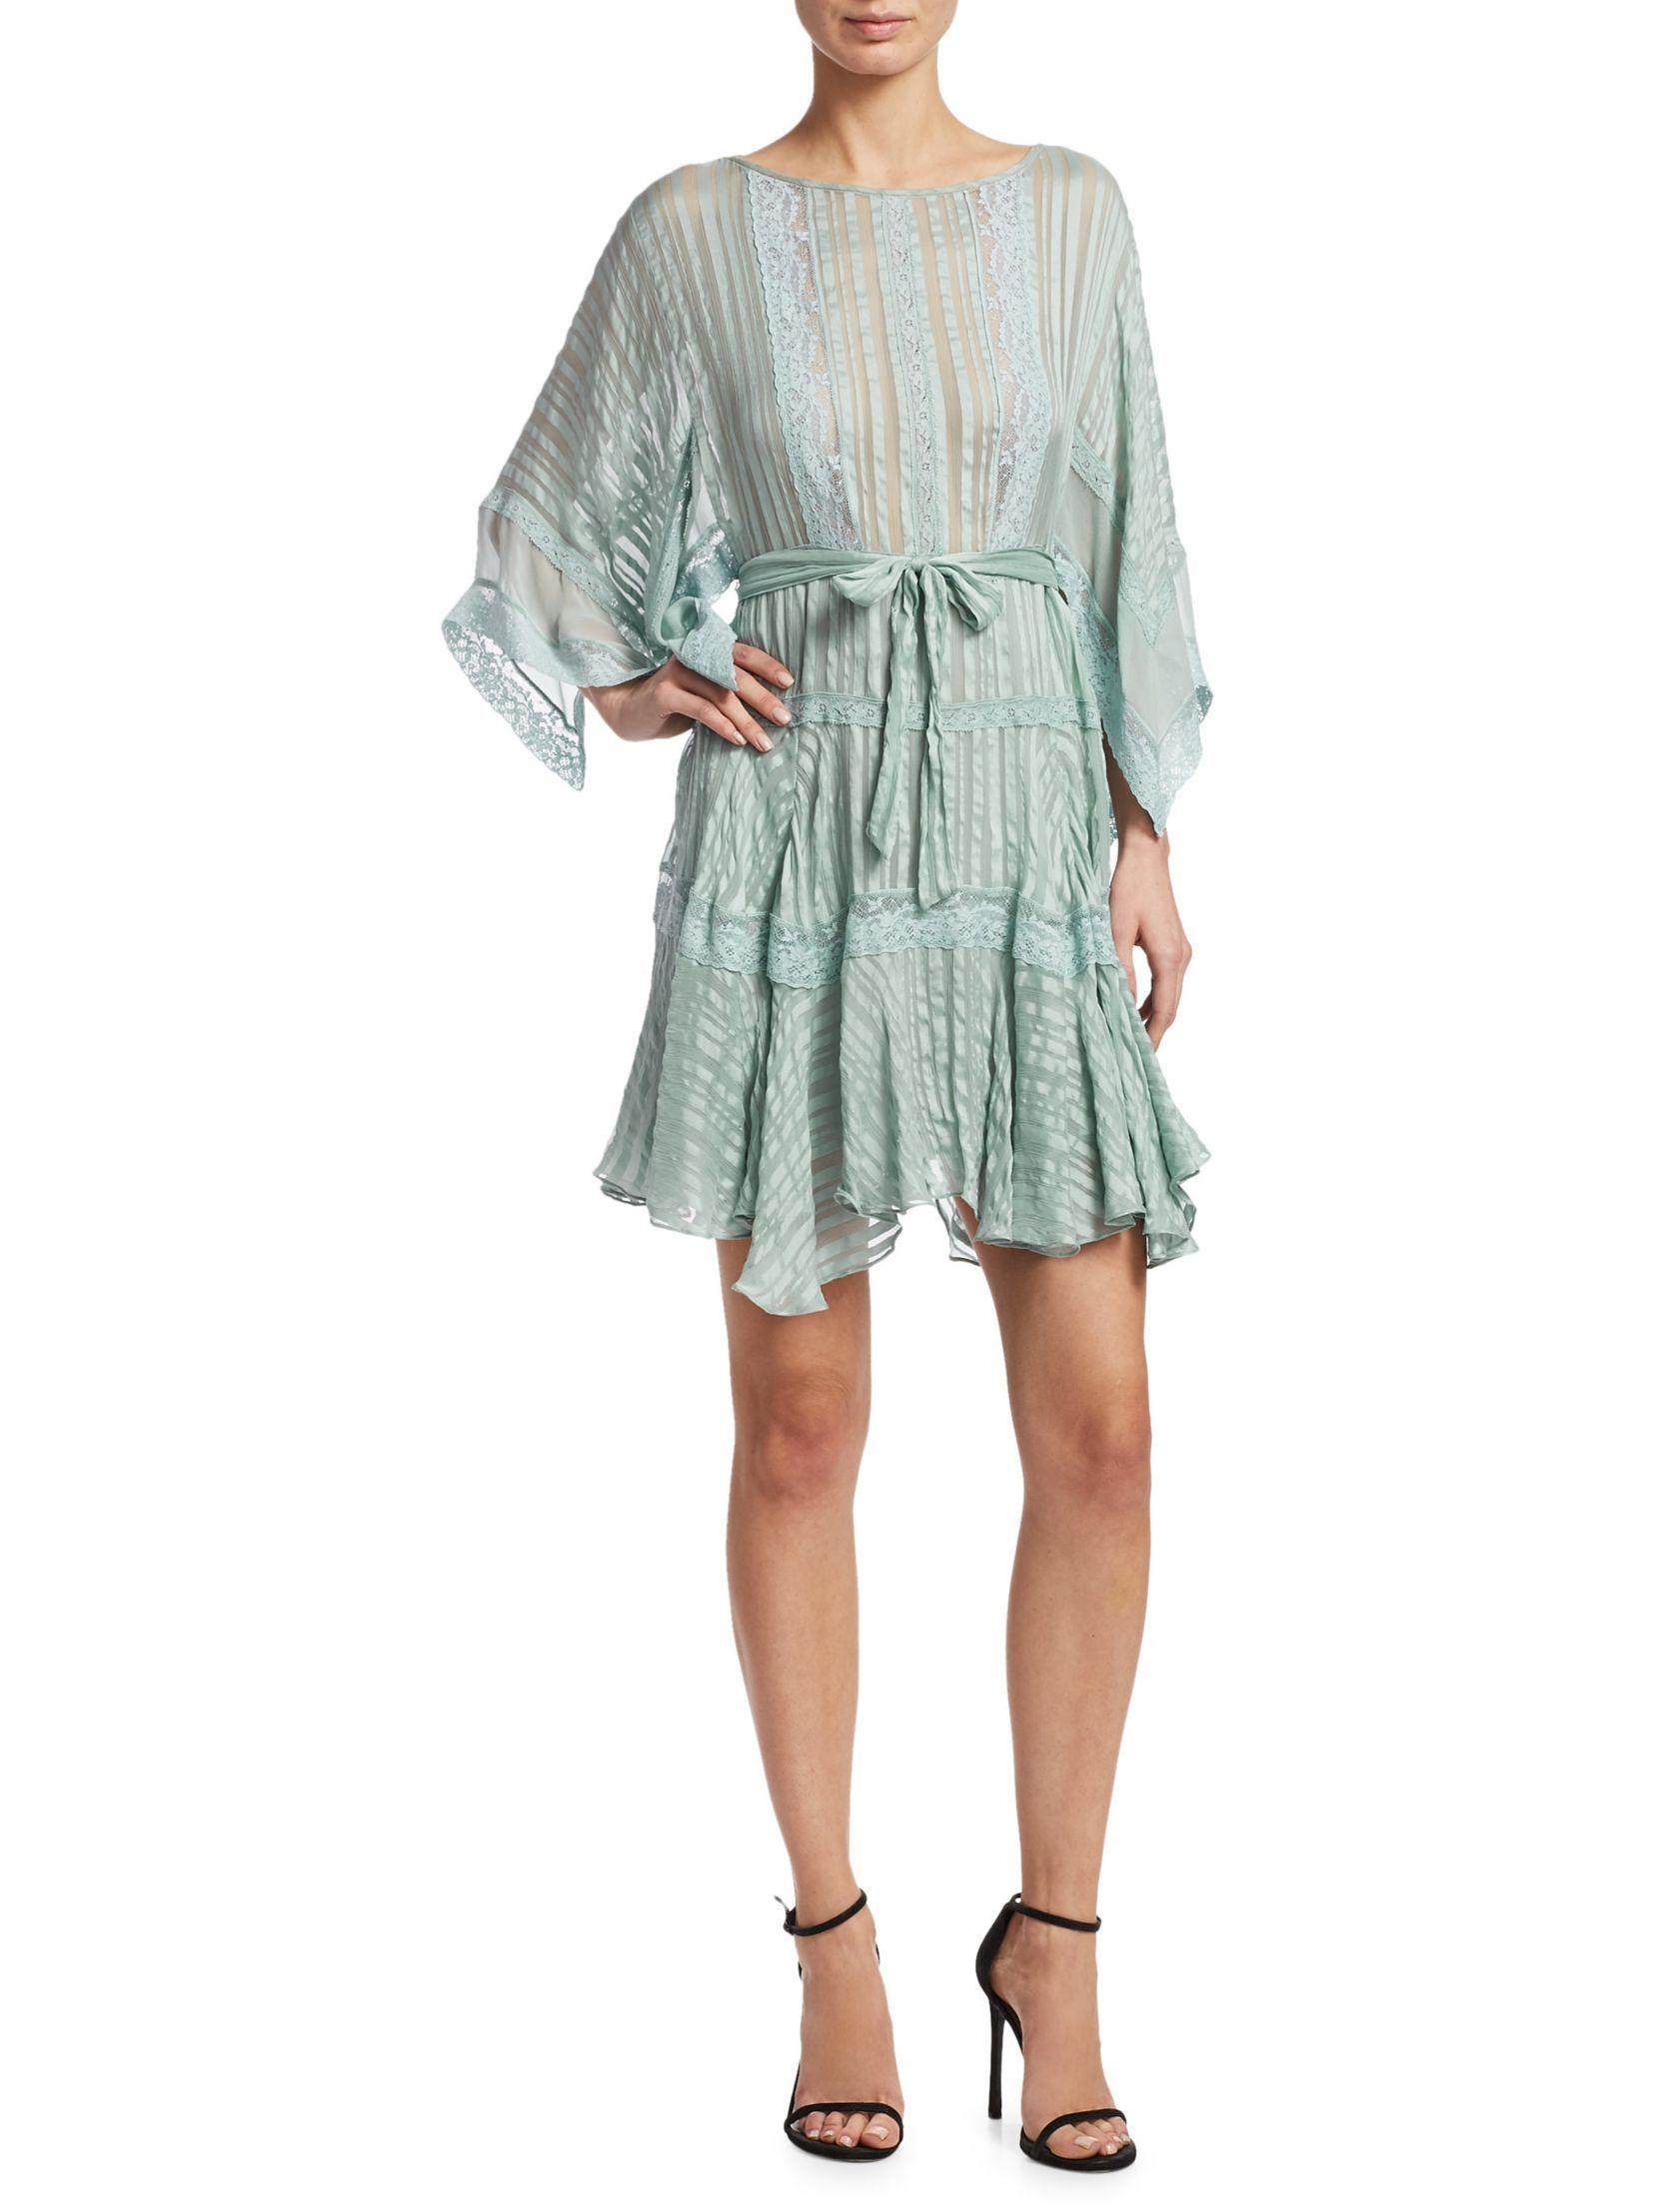 Breeze Wrap Mini Dress in Green Zimmermann Best Prices Cheap Online UVMxF2